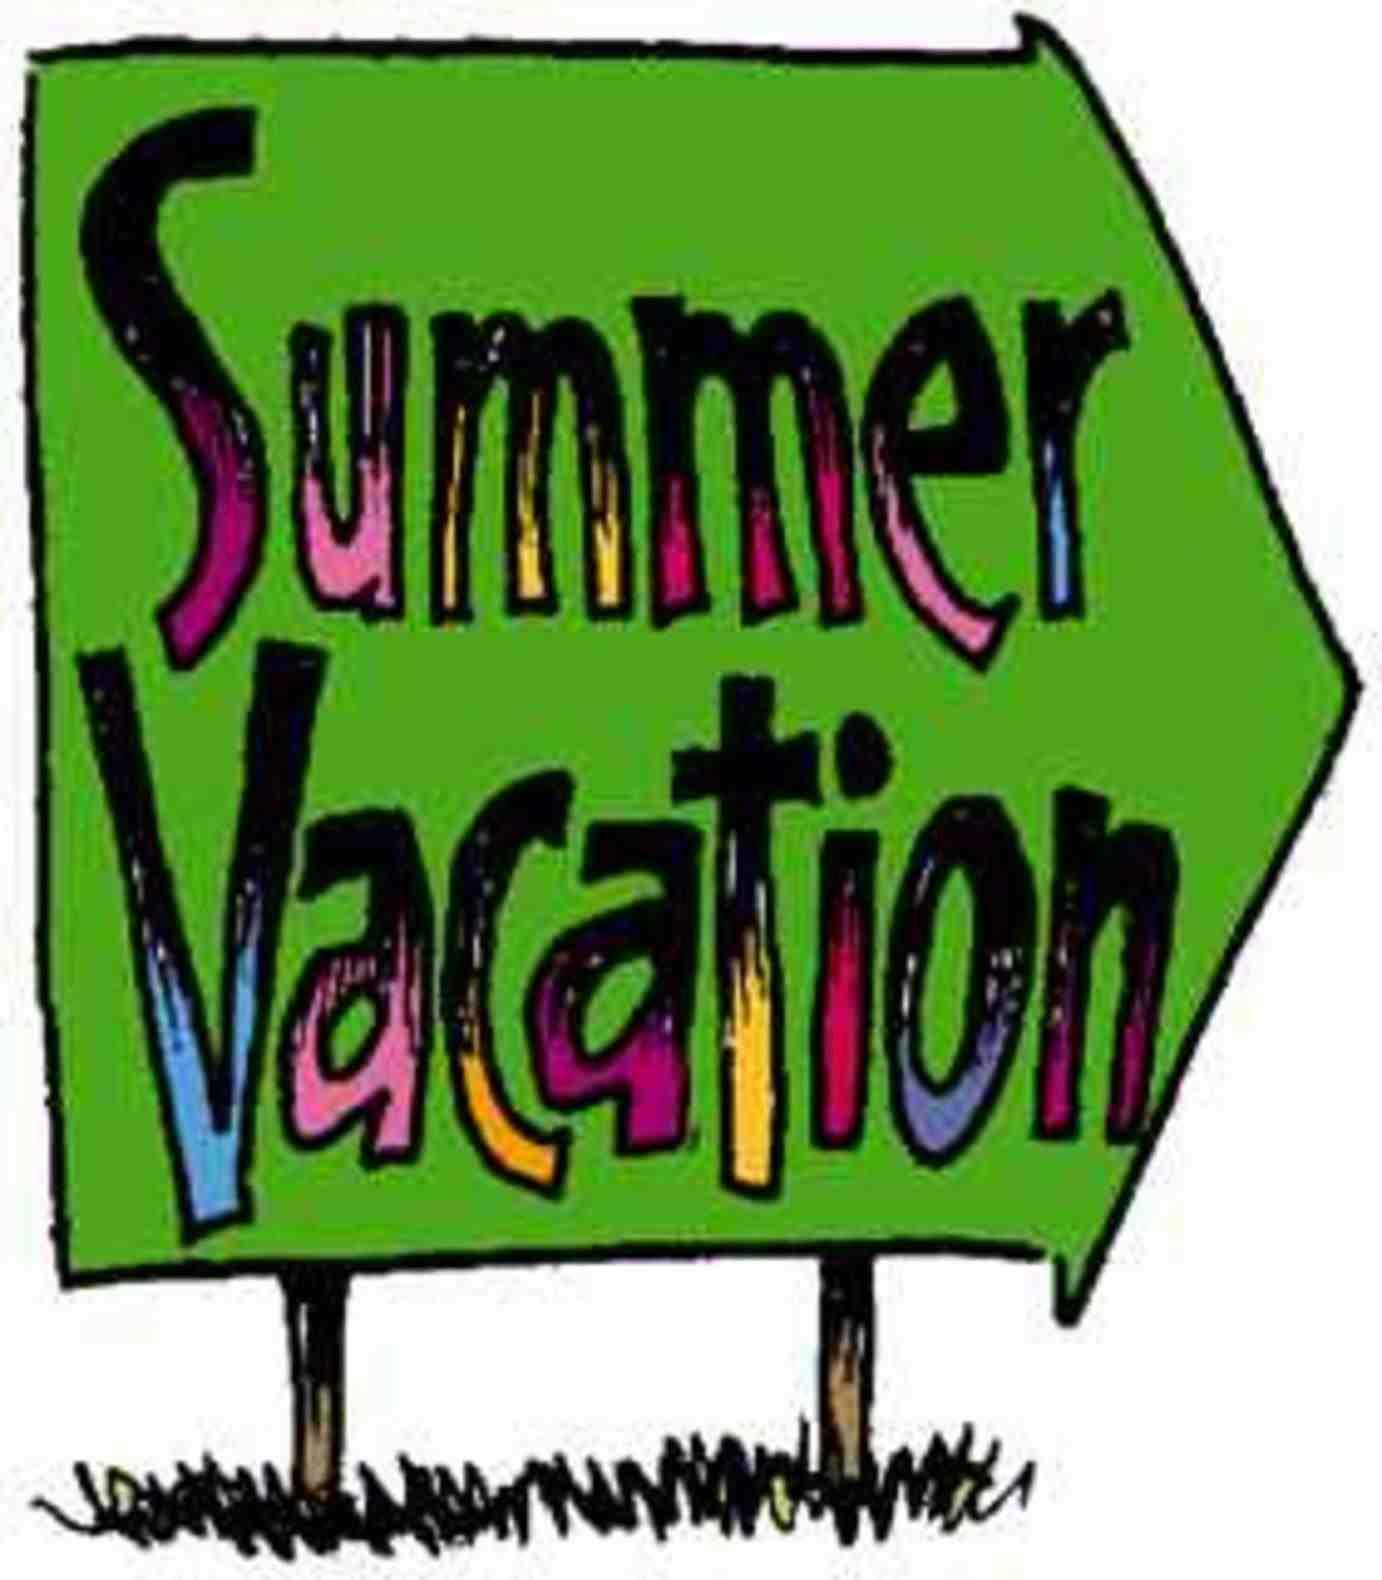 1382x1580 Christmas Vacation Rv Clipart Cheminee.website